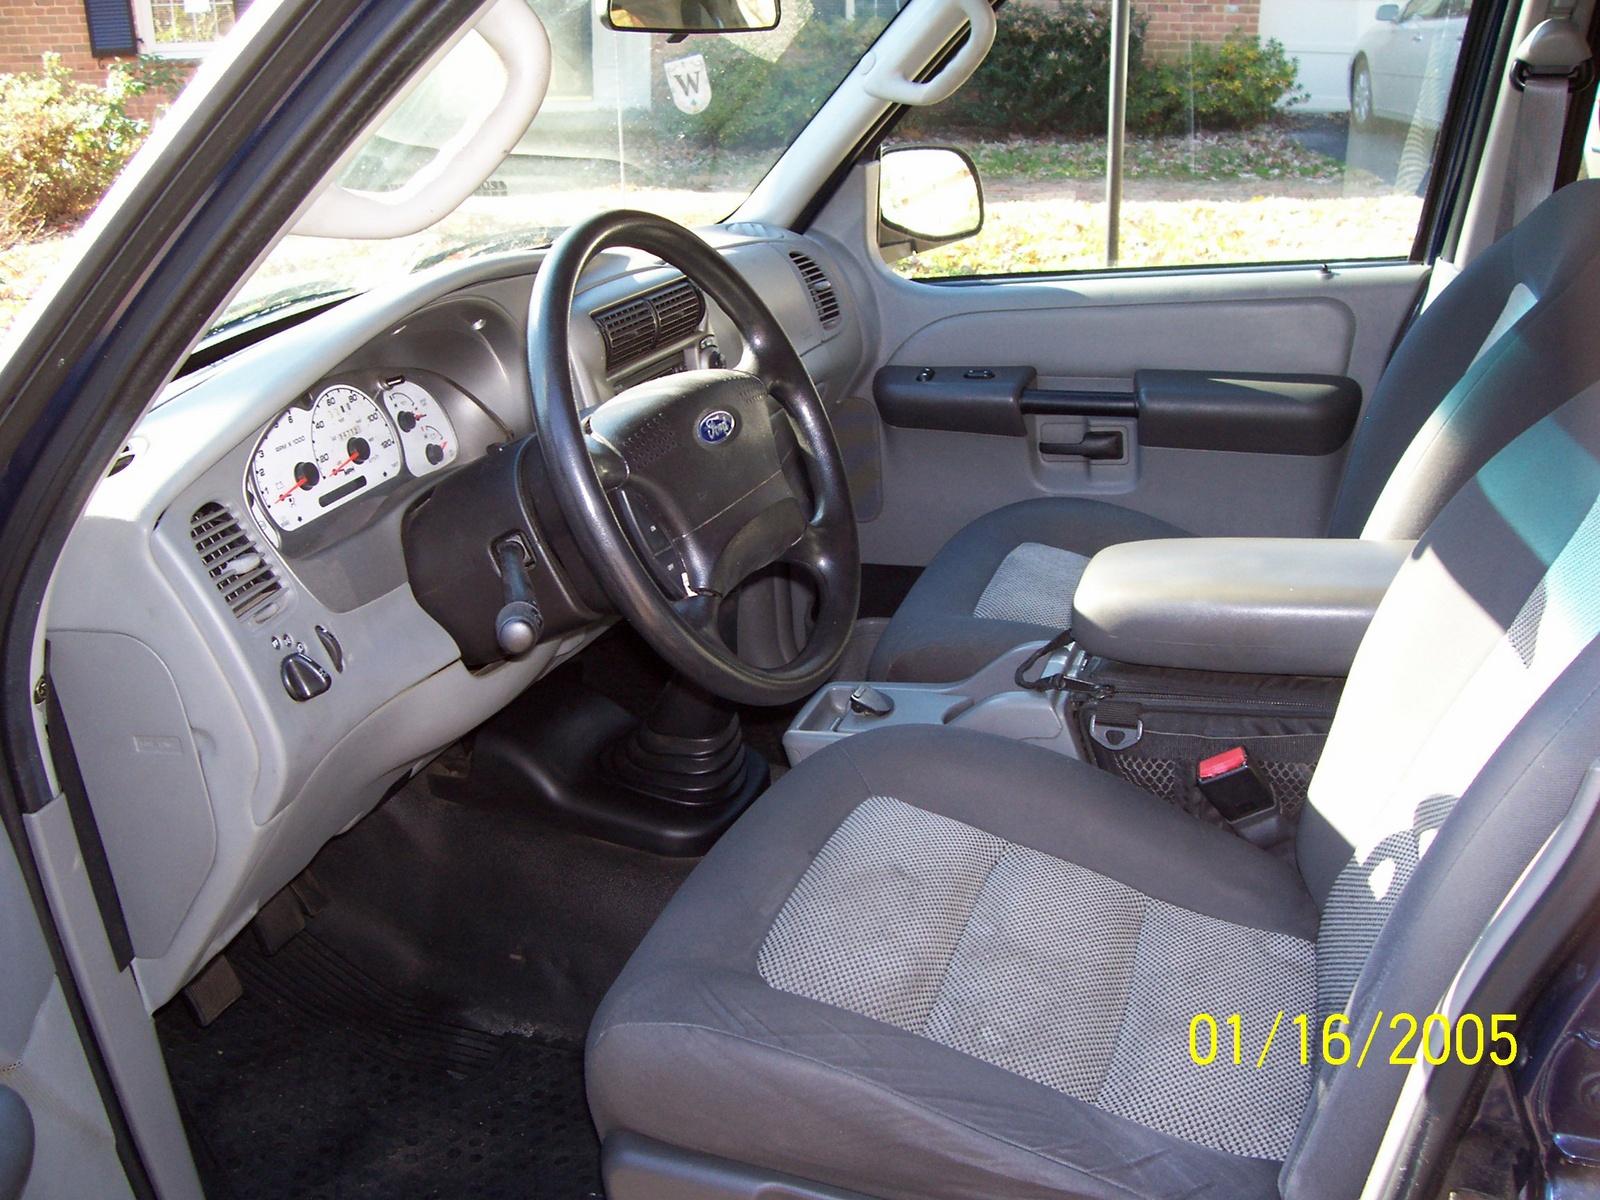 2003 Ford Explorer Sport Trac Interior 2003 Ford Explorer Sport Trac